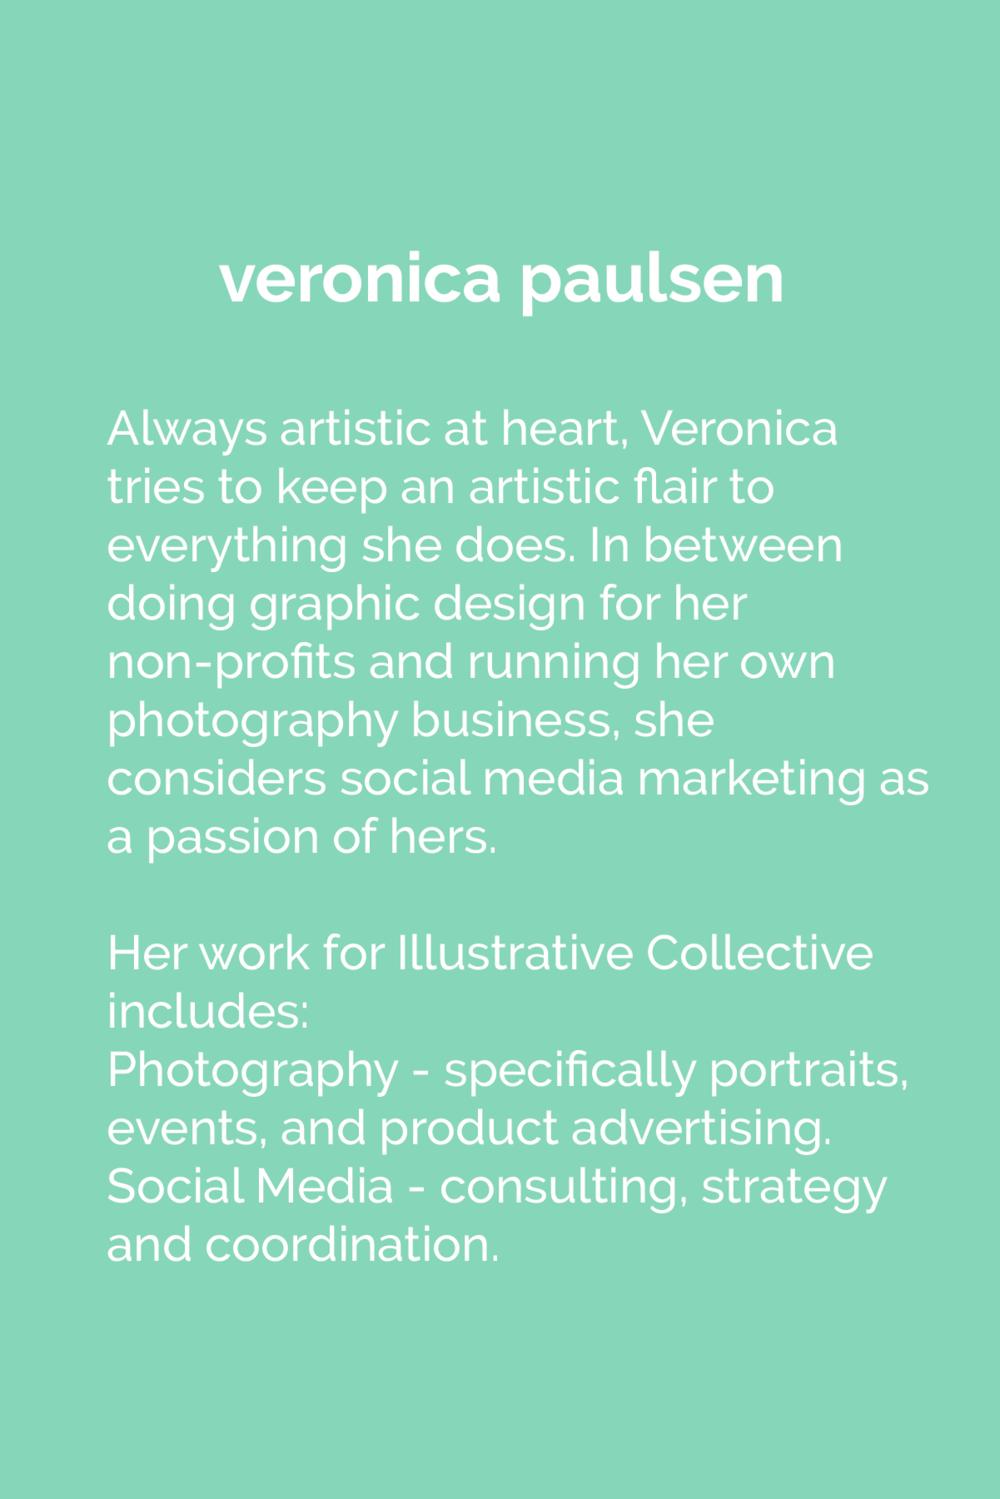 Veronica.png